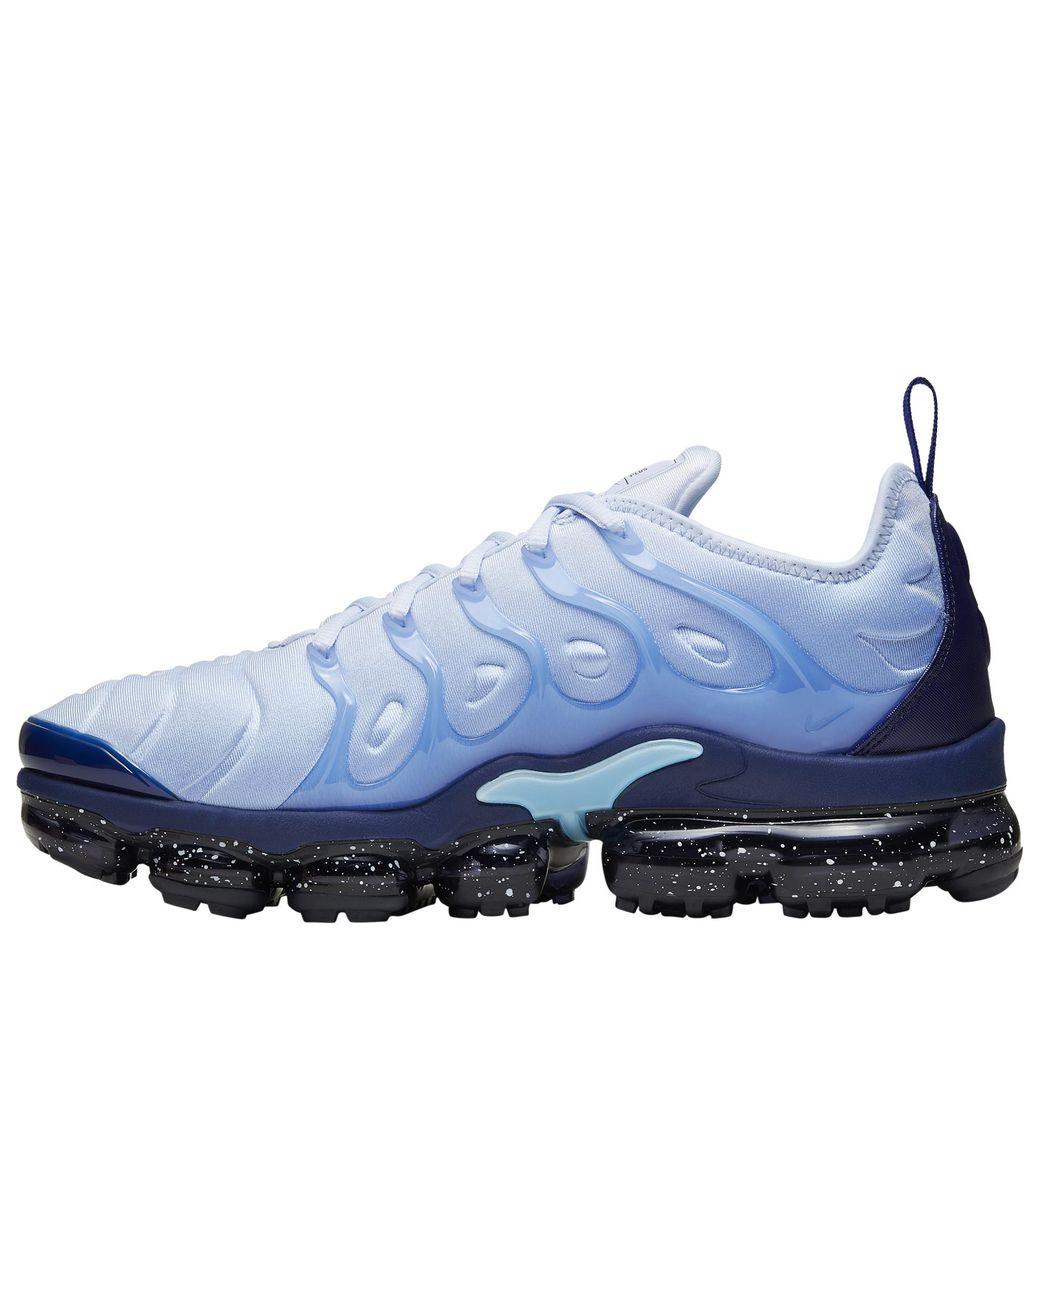 sports shoes a4bae 6ce63 Men's Blue Air Vapormax Plus Running Shoes